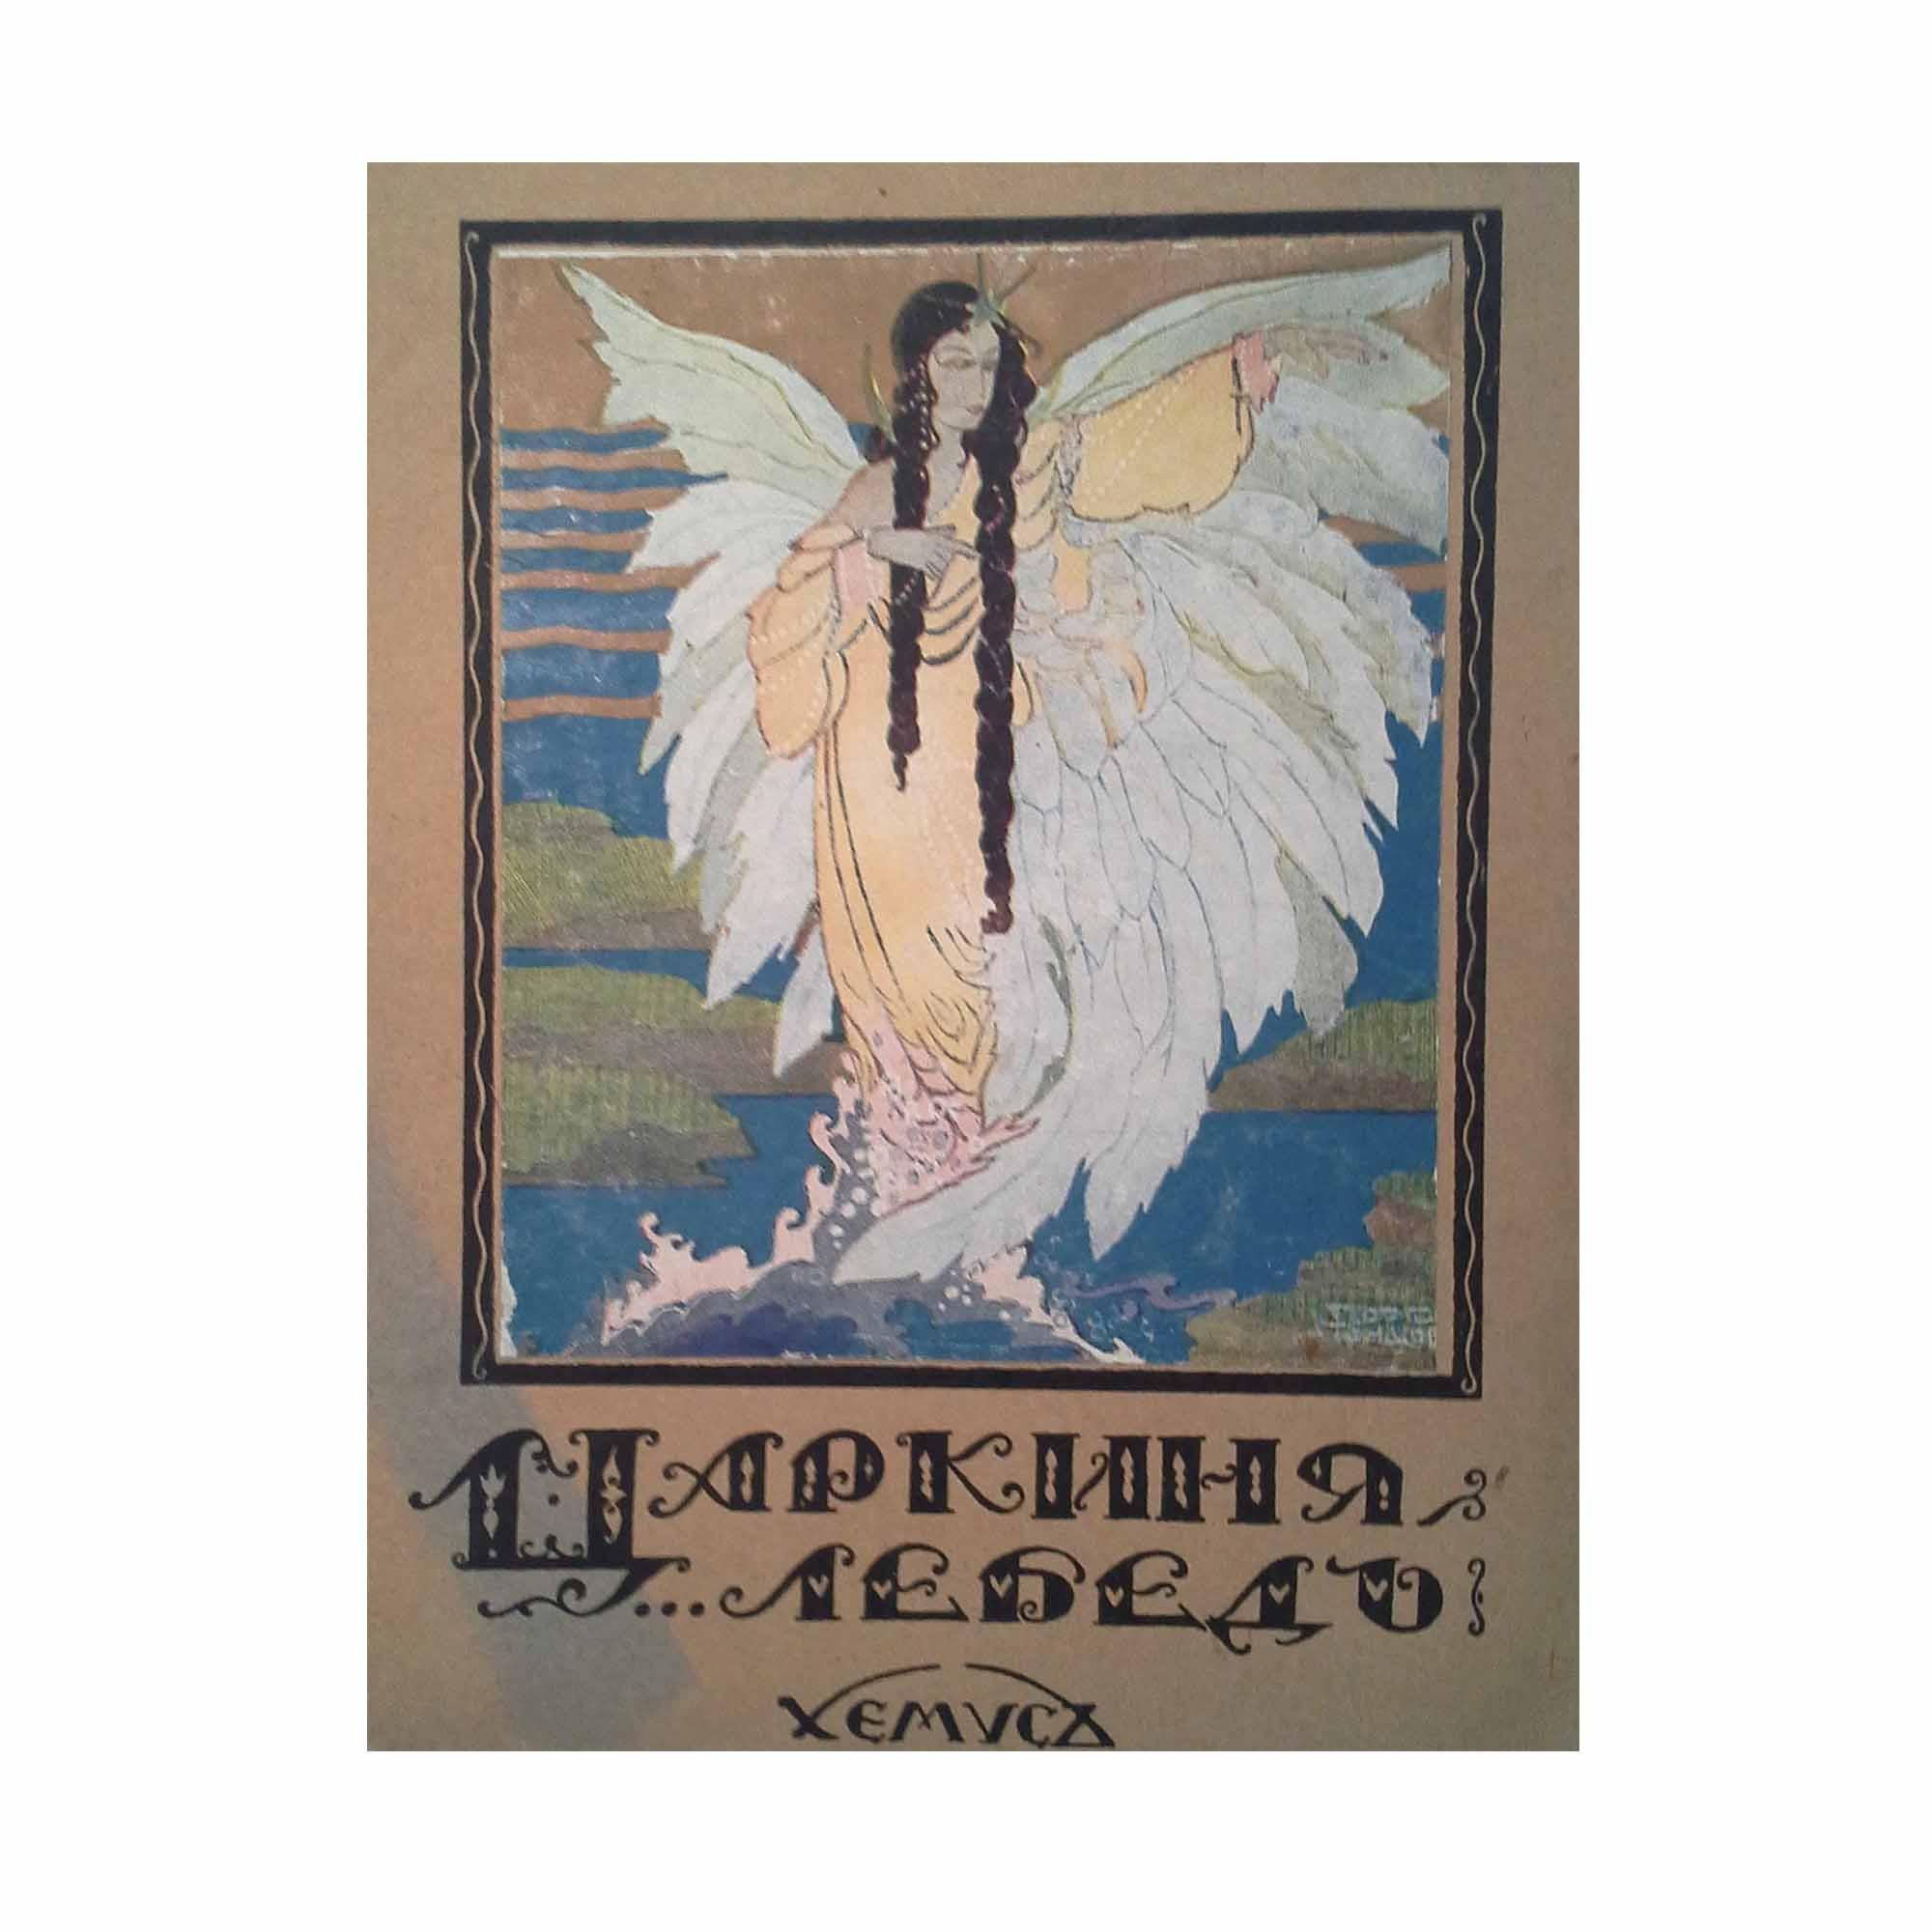 1266-Pushkin-Czarkinya-lebed-Bulgarisch-Bosilek-1926-1-A-N.jpg